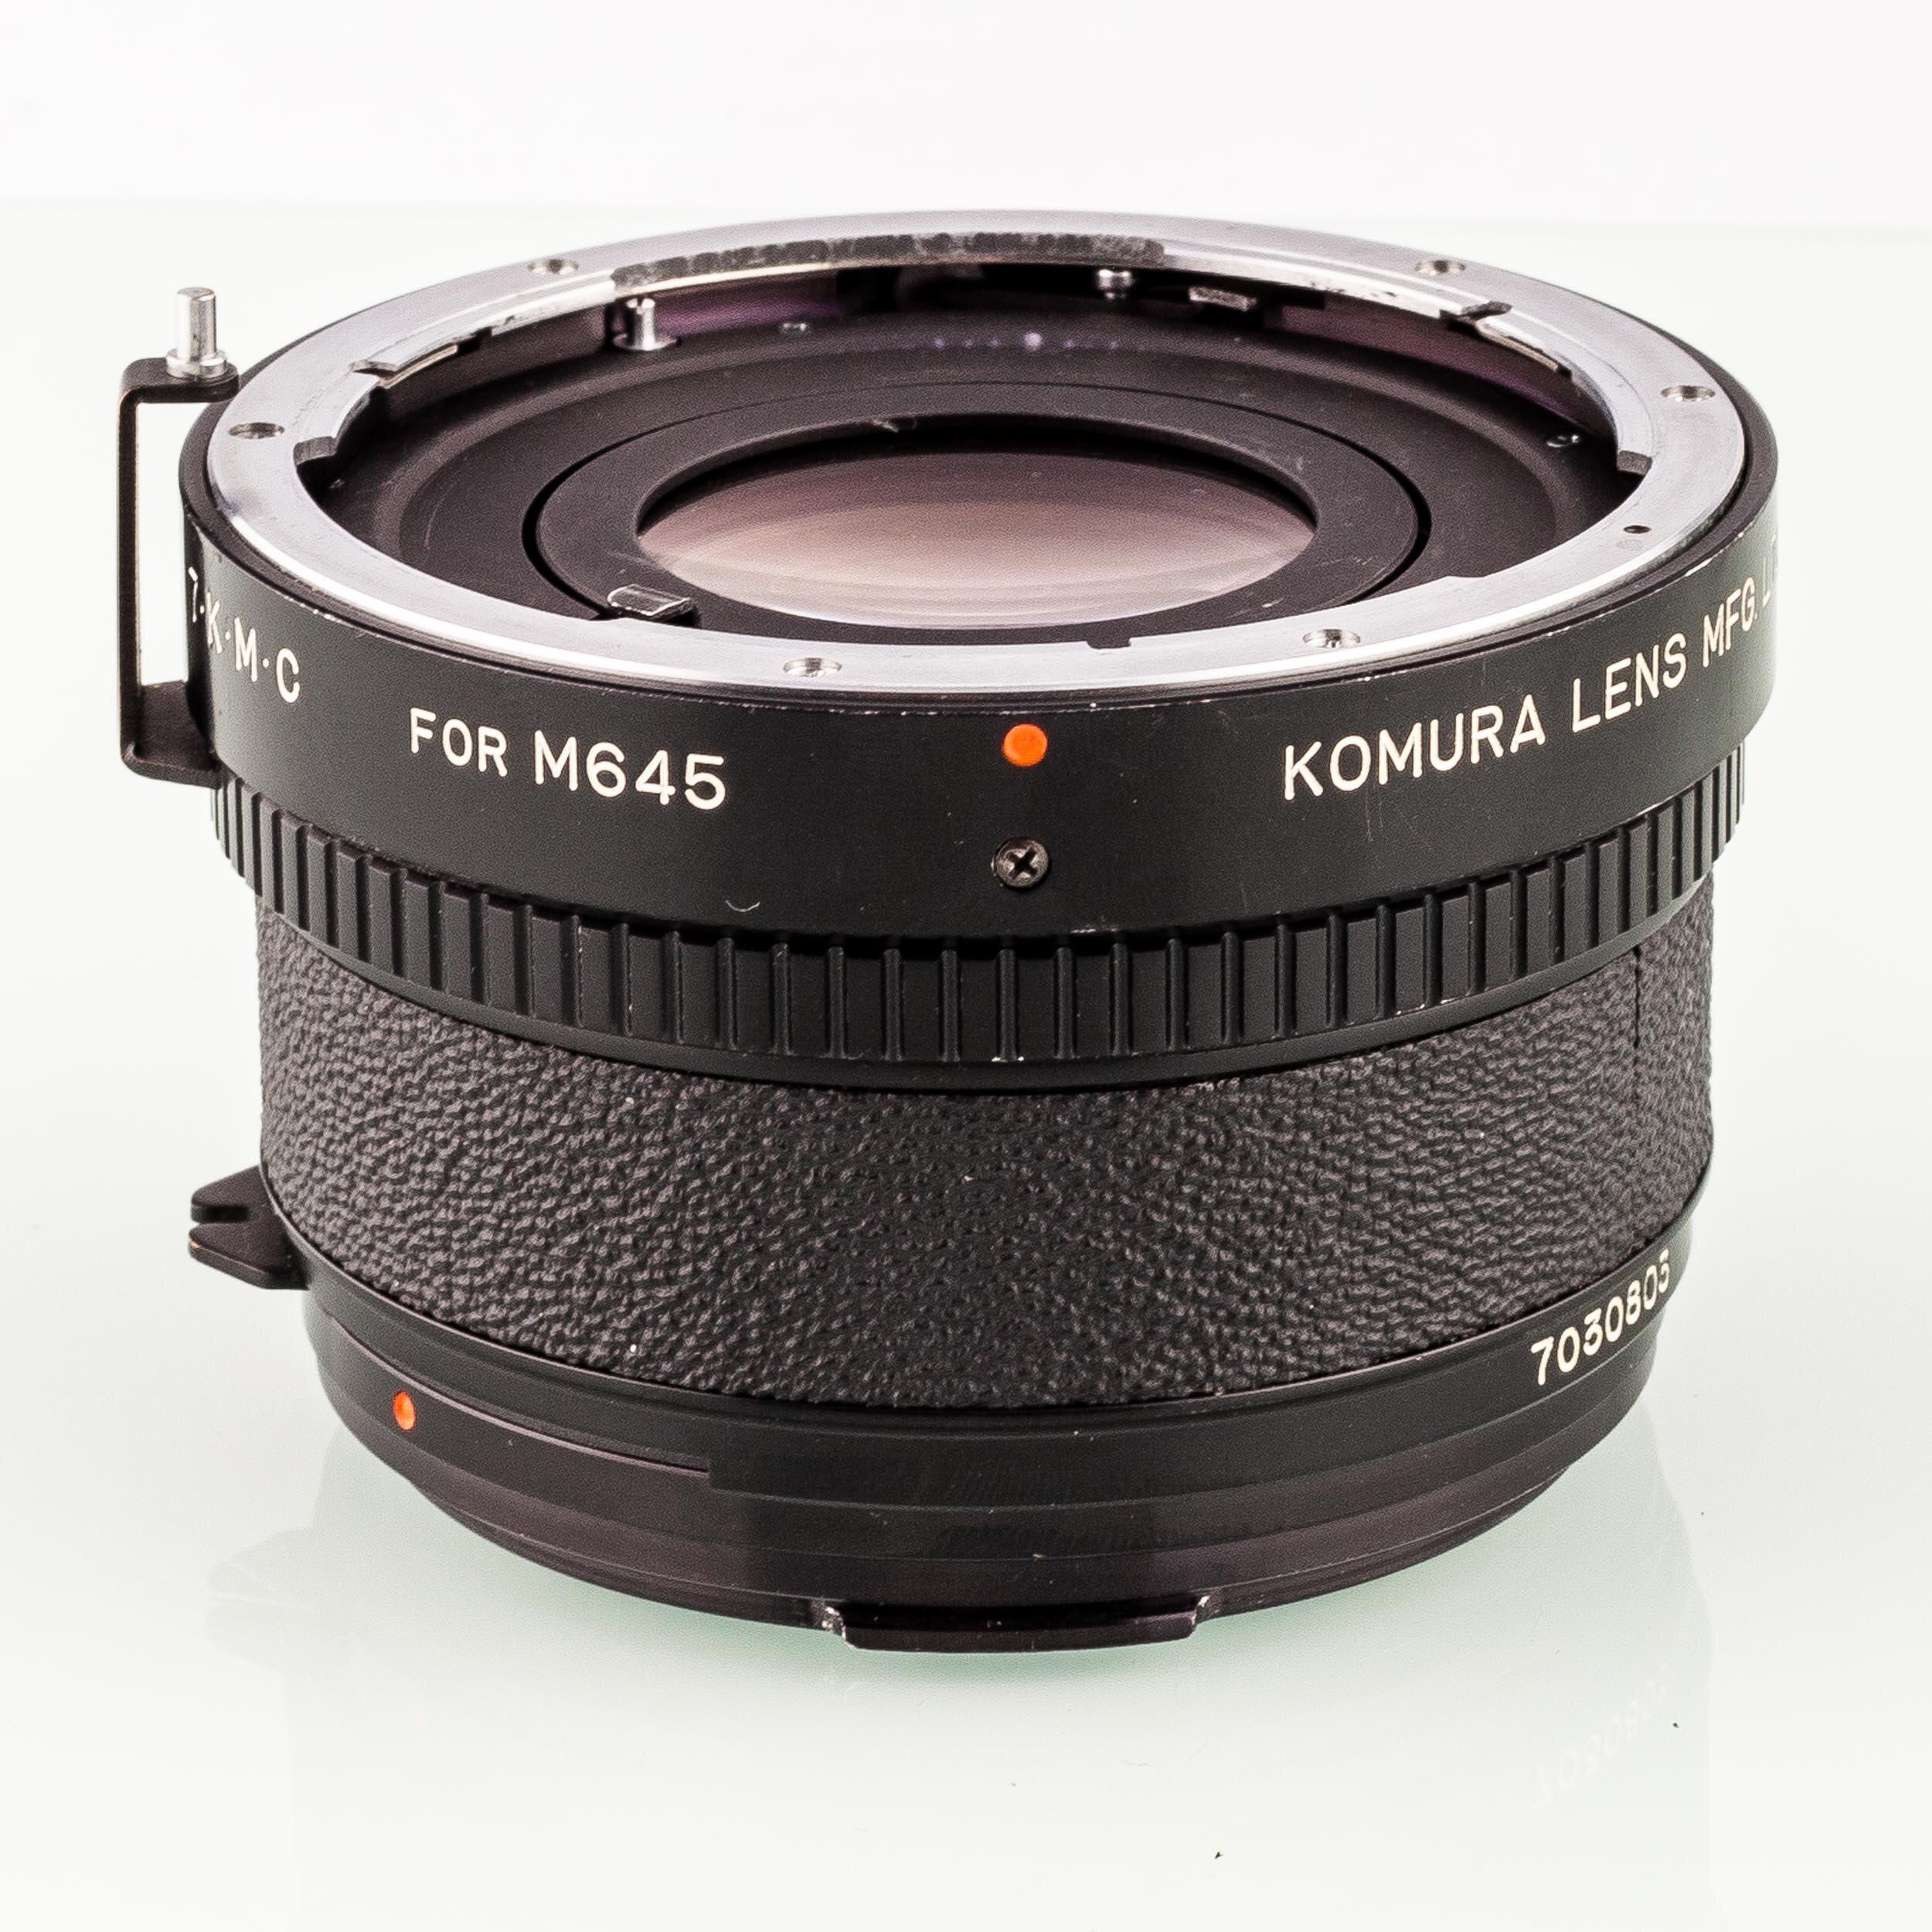 Komura Telemore II 7-K-M-C for M645